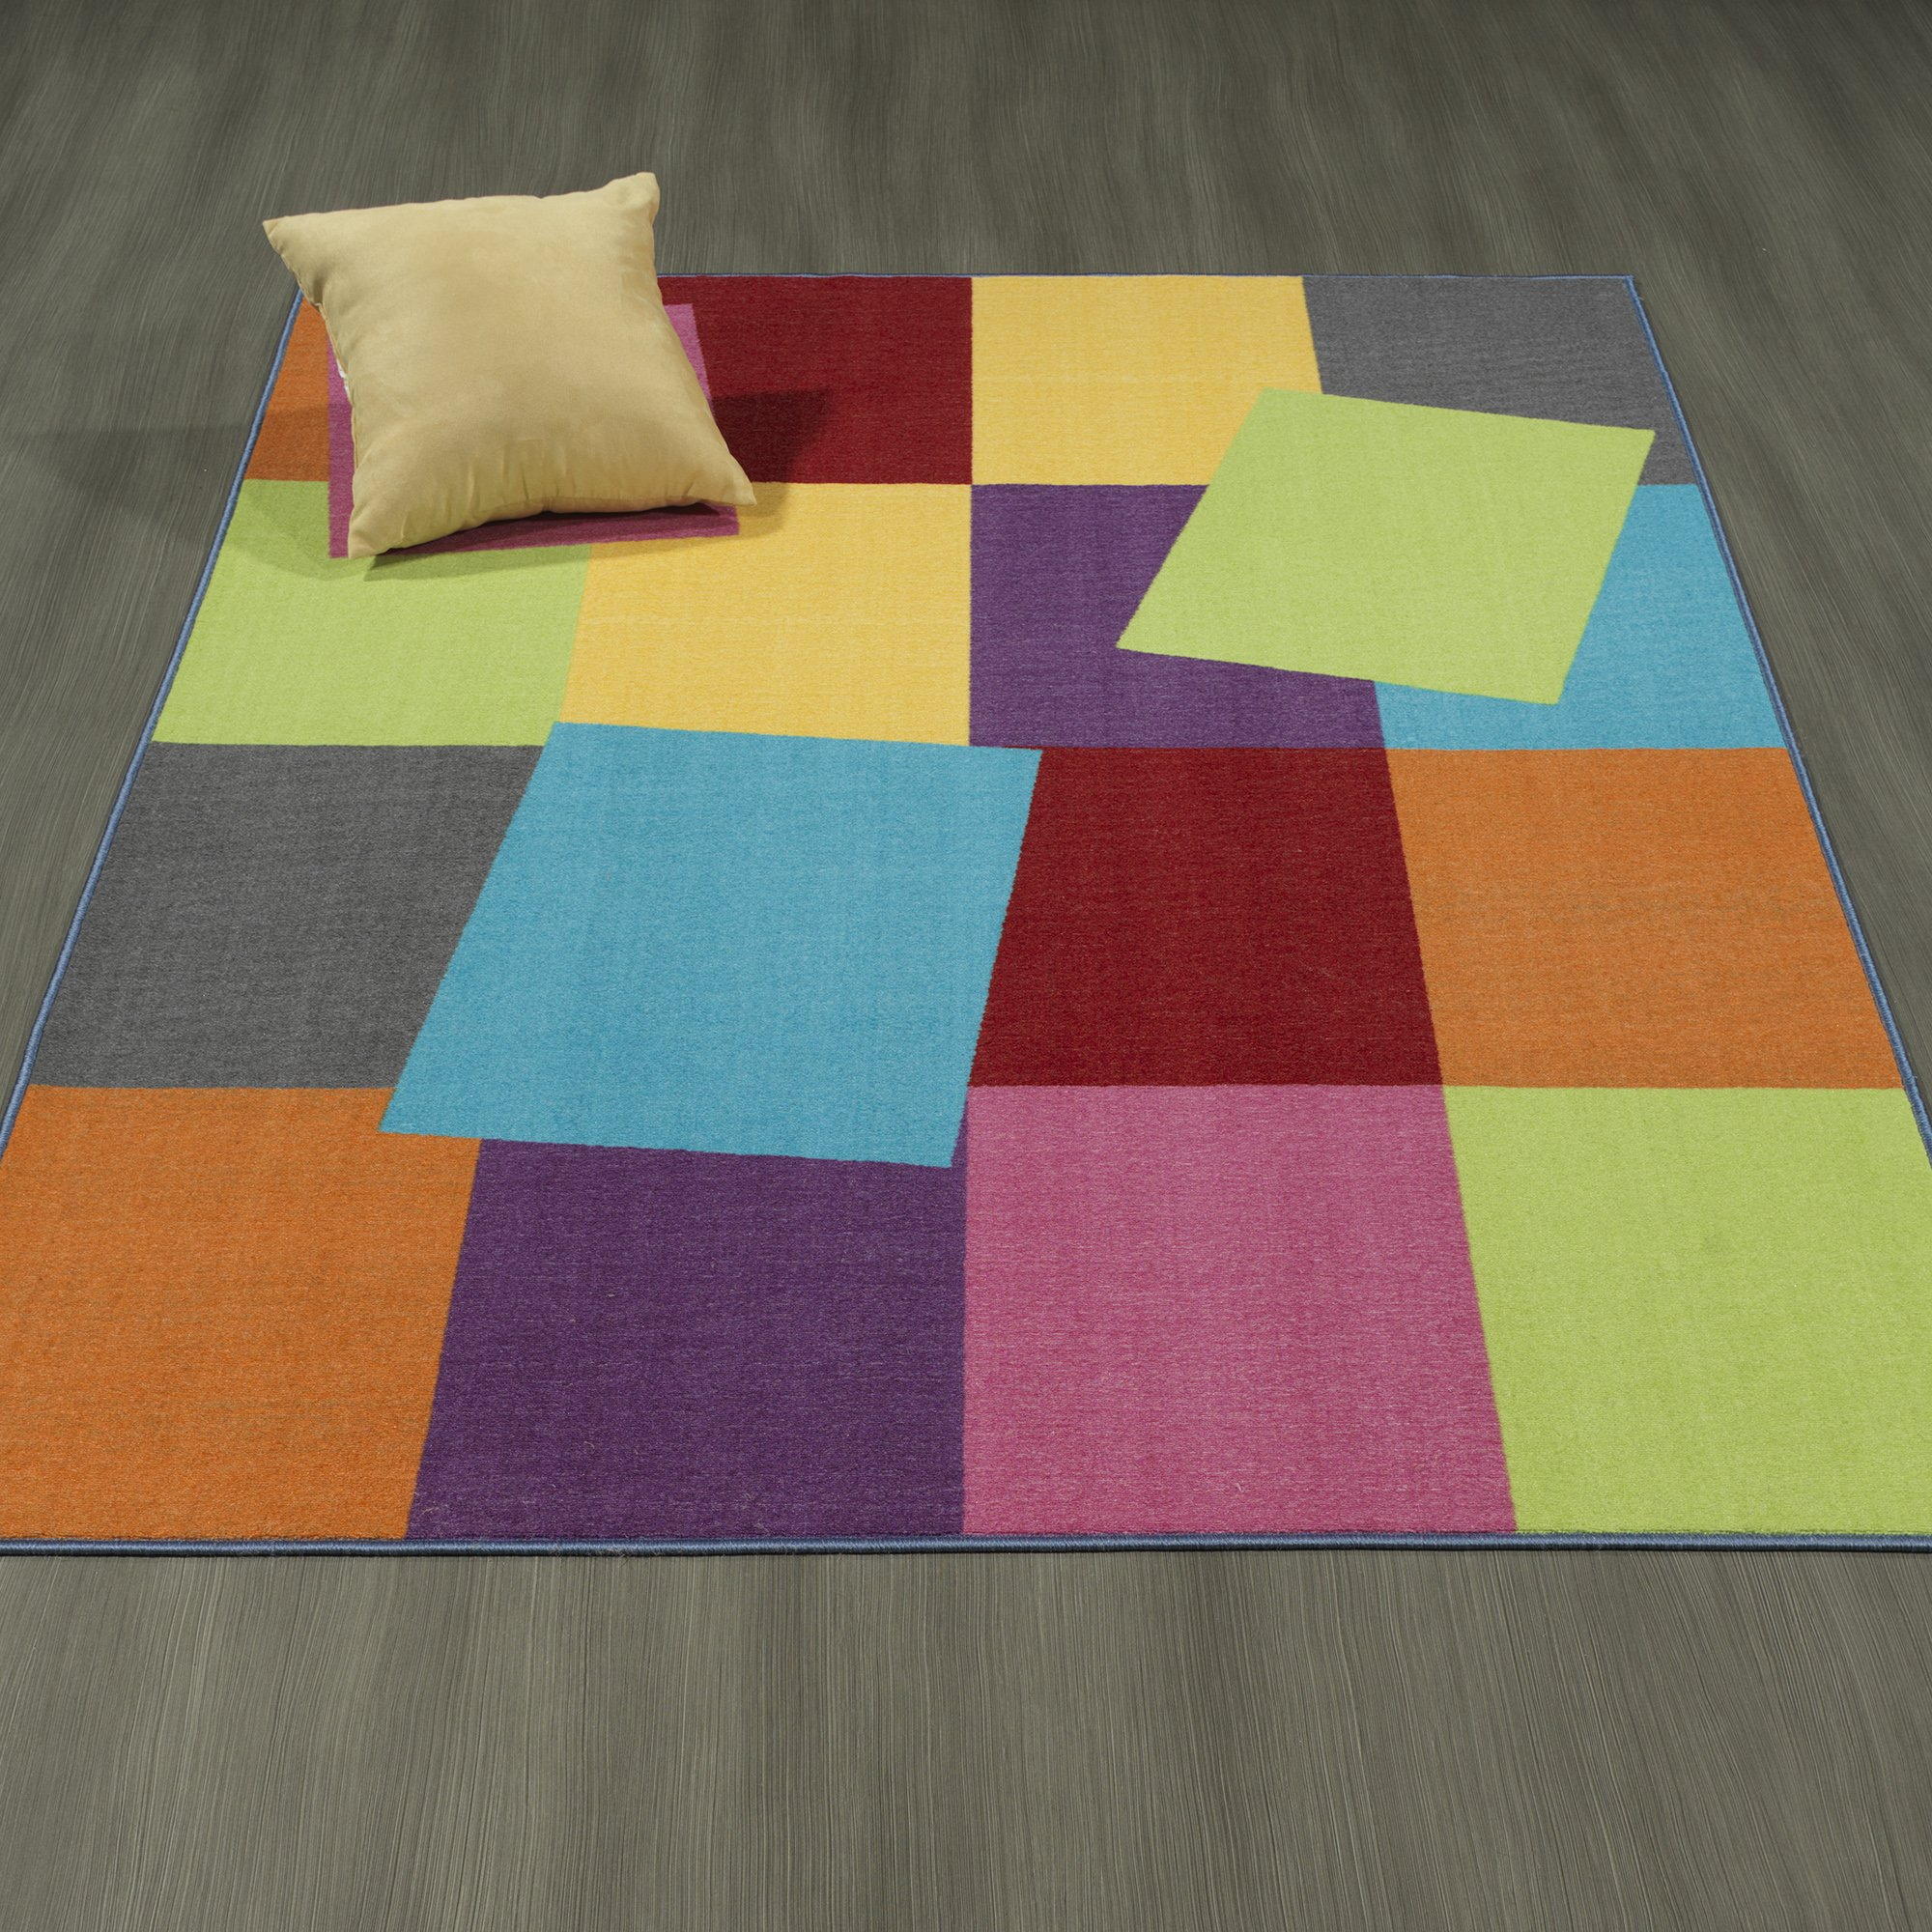 Ottomanson Rainbow Collection Non-Slip Modern Rectangle Pattern Design Area 98'' x 118'' Kids Rug, 8'2'' x 9'10'', Multicolor